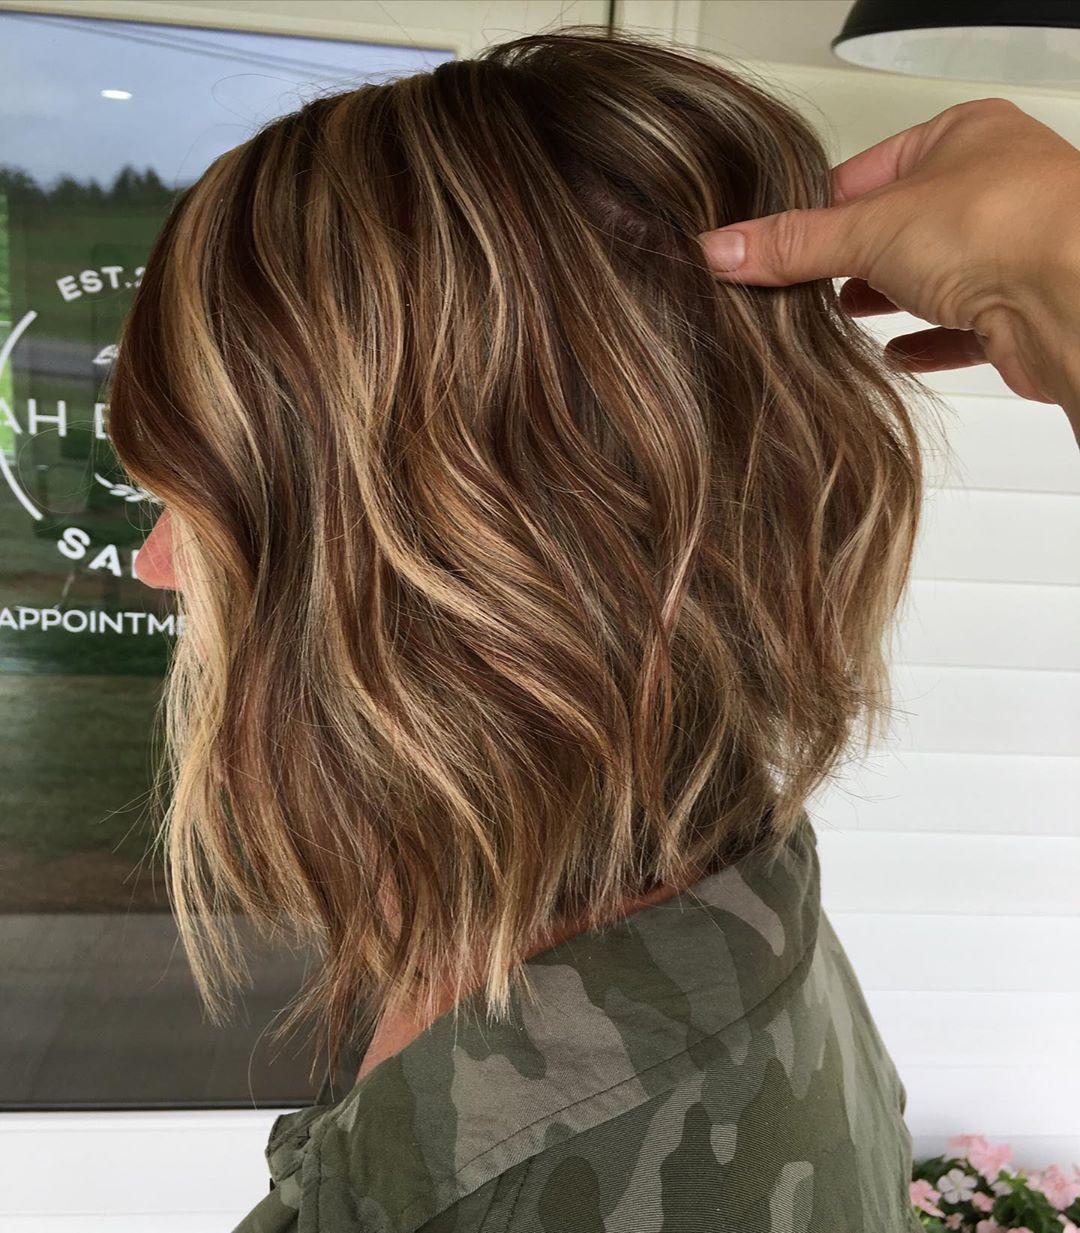 Just like that she's ready for fall 🧚♀️ #blonde #brunette #highlights #modernsalon #btcfirstfeature #behindthechair #masterofbalayage #foilayage #lewisburgpa #redhair #bob #dimensionalbrunette #dimensionalblonde #livedincolor